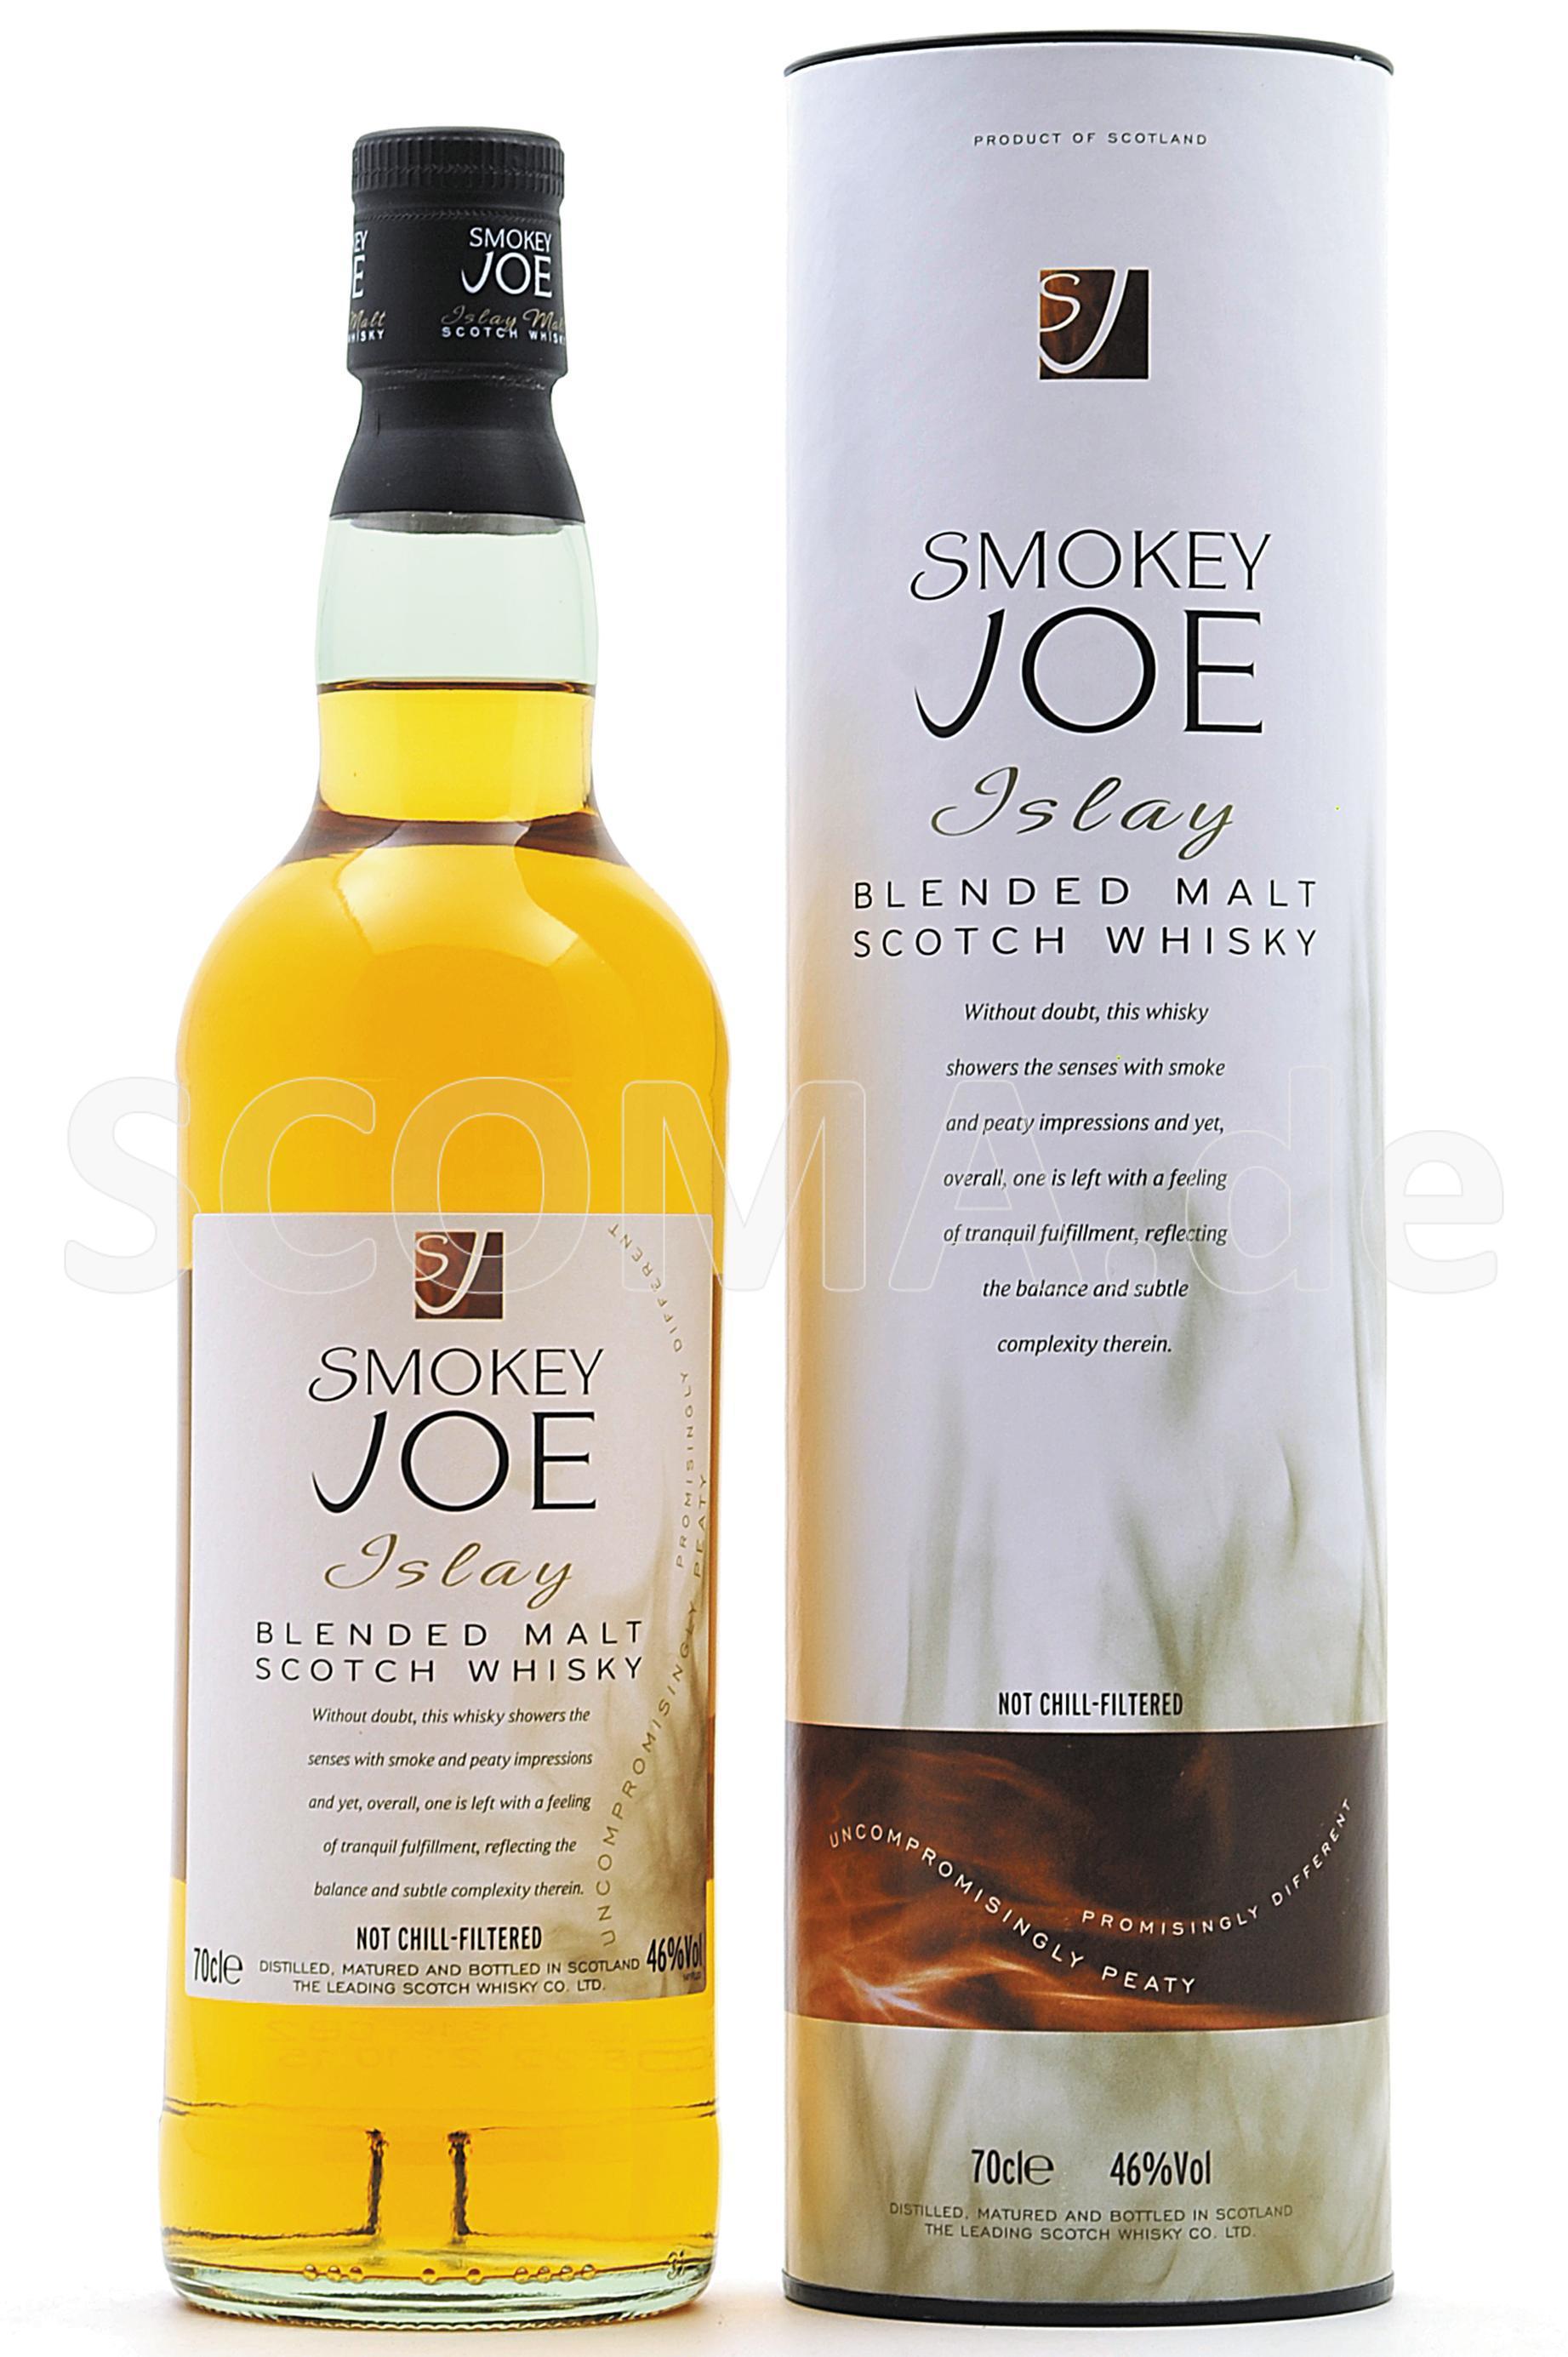 Smokey Joe Islay